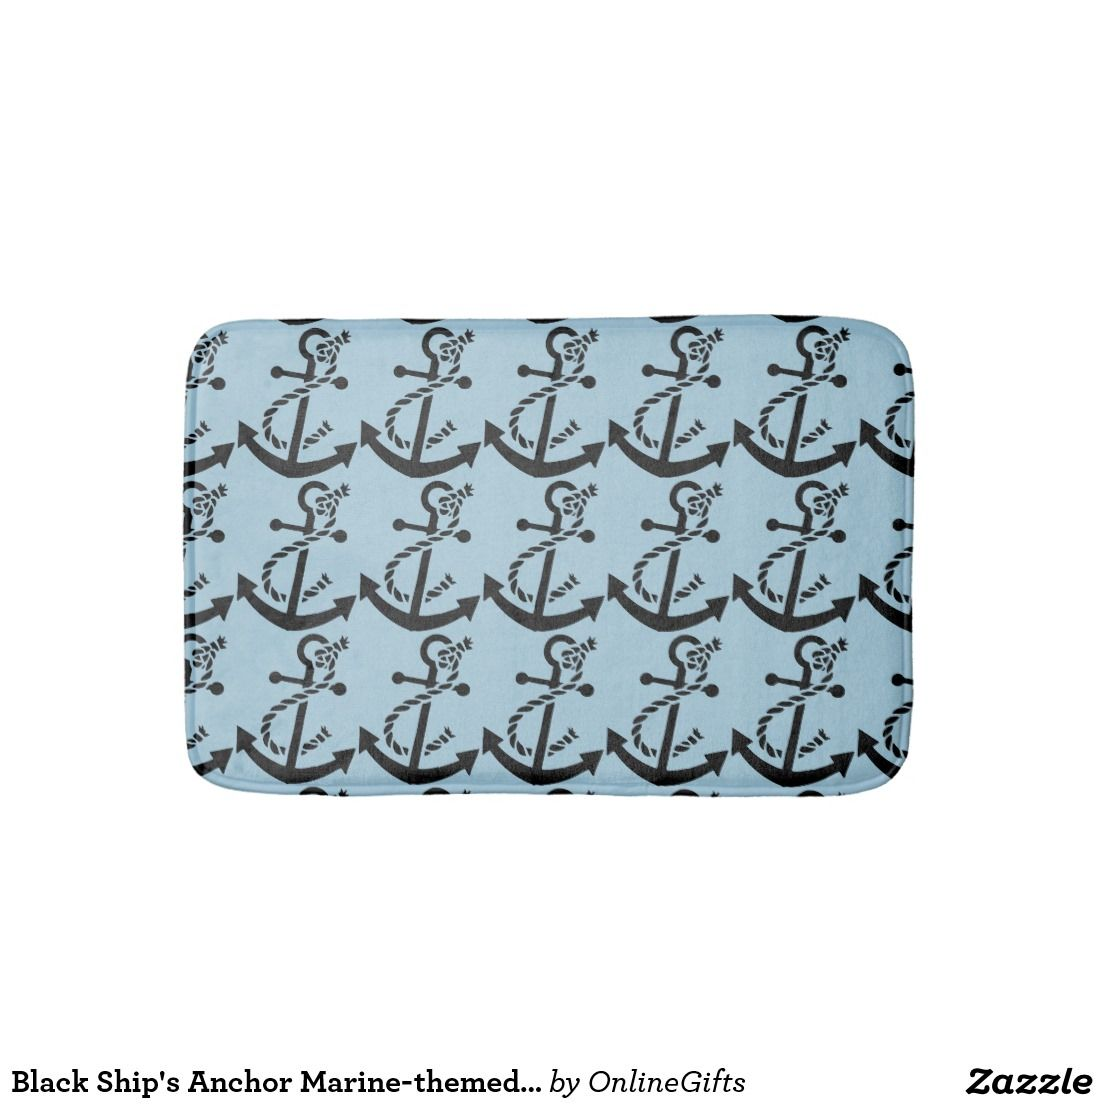 Black Ship's Anchor Marine-themed Nautical Design